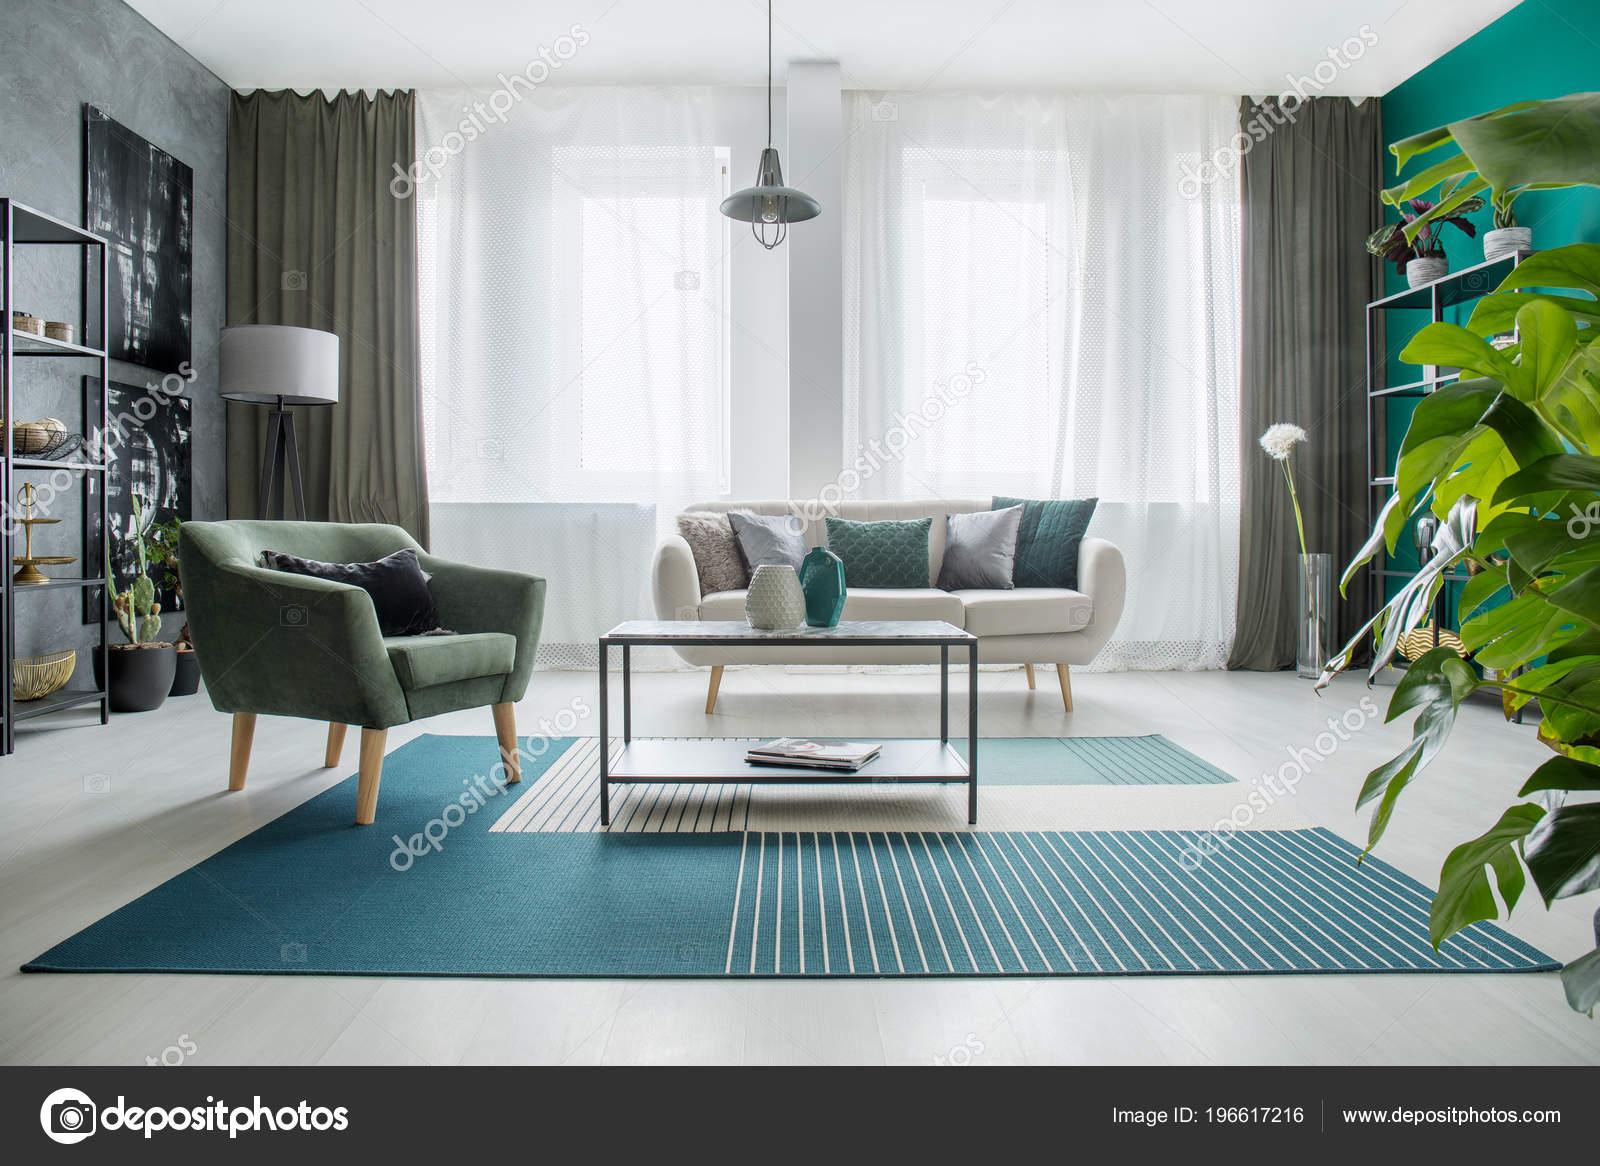 Table Carpet Next Green Armchair Beige Sofa Bright Living Room Stock Photo C Photographee Eu 196617216